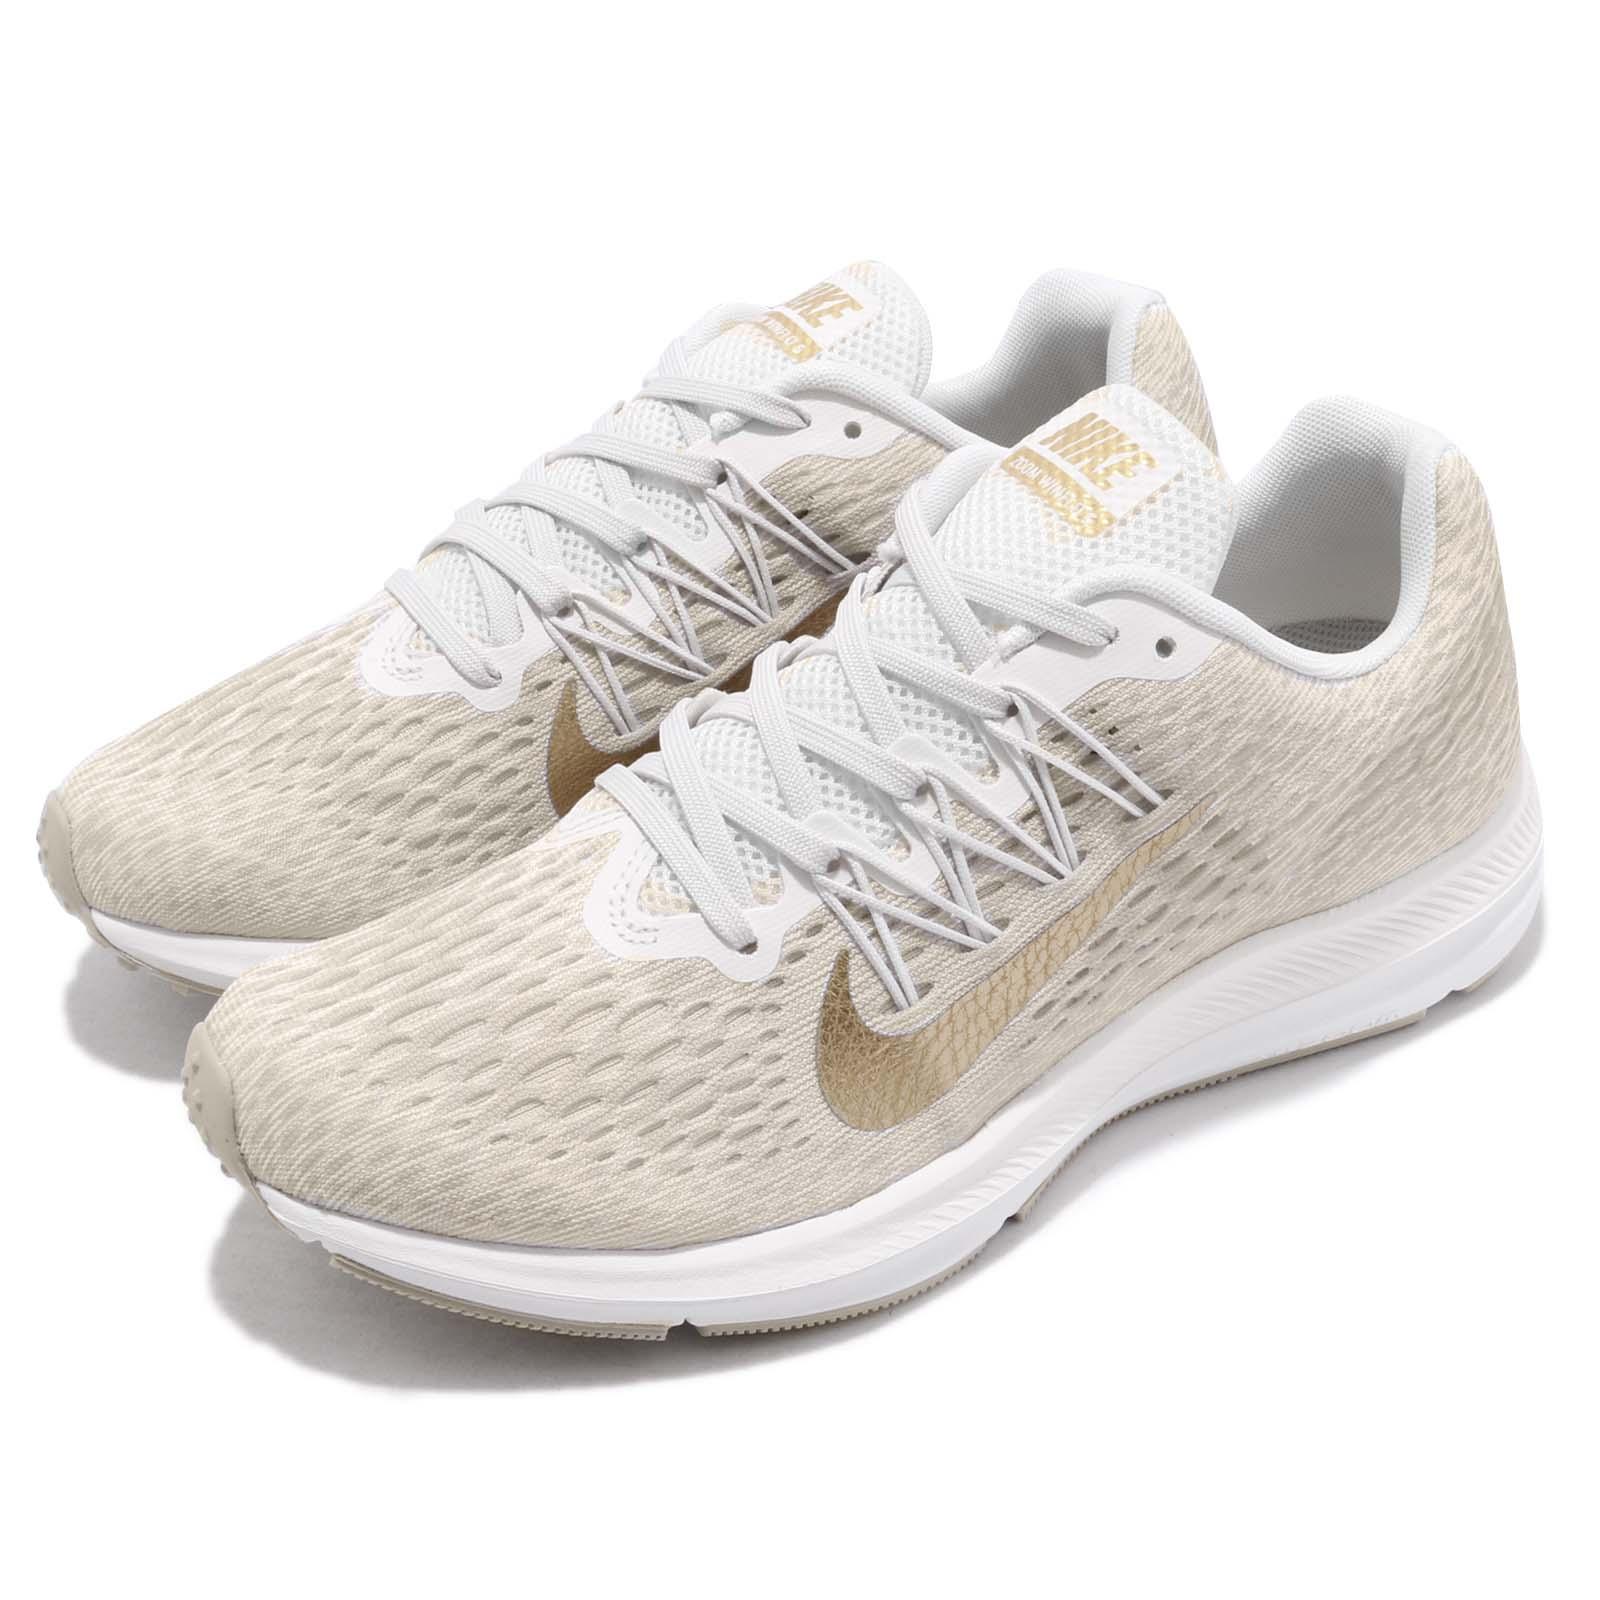 Nike 慢跑鞋 Zoom Winflo 5 女鞋 AA7414-008